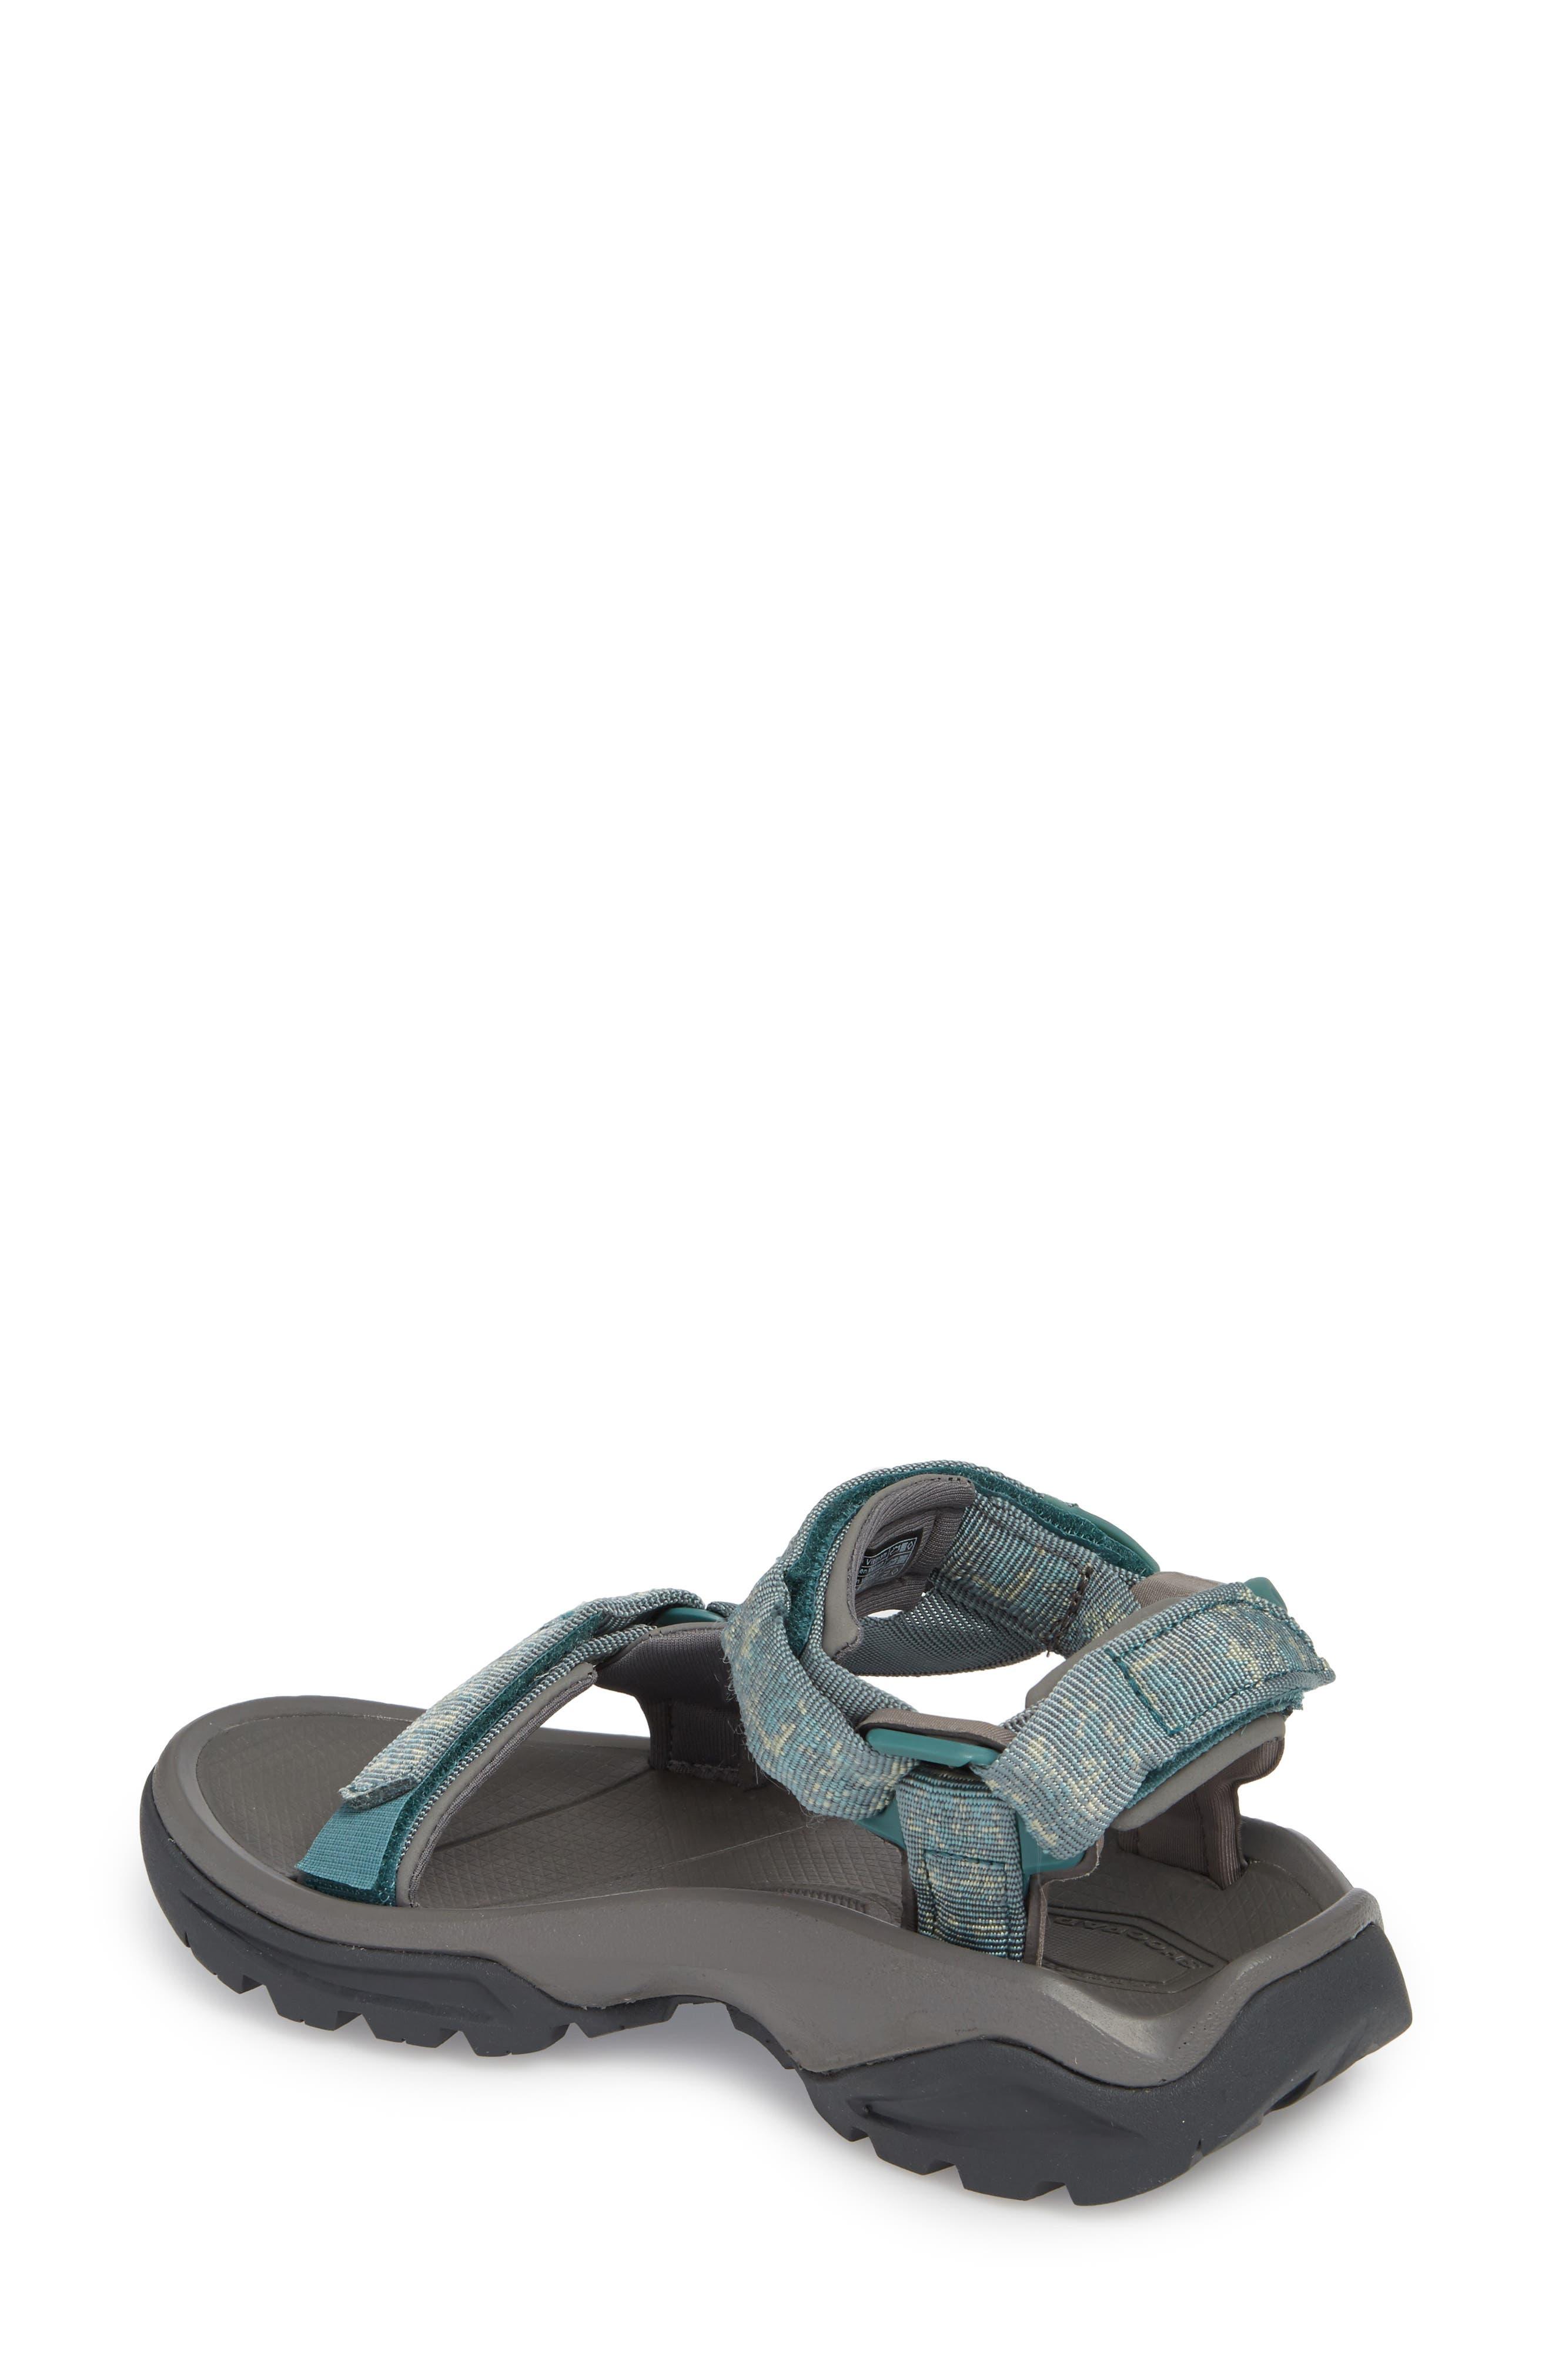 Terra FI 4 Sport Sandal,                             Alternate thumbnail 2, color,                             Rocio North Atlantic